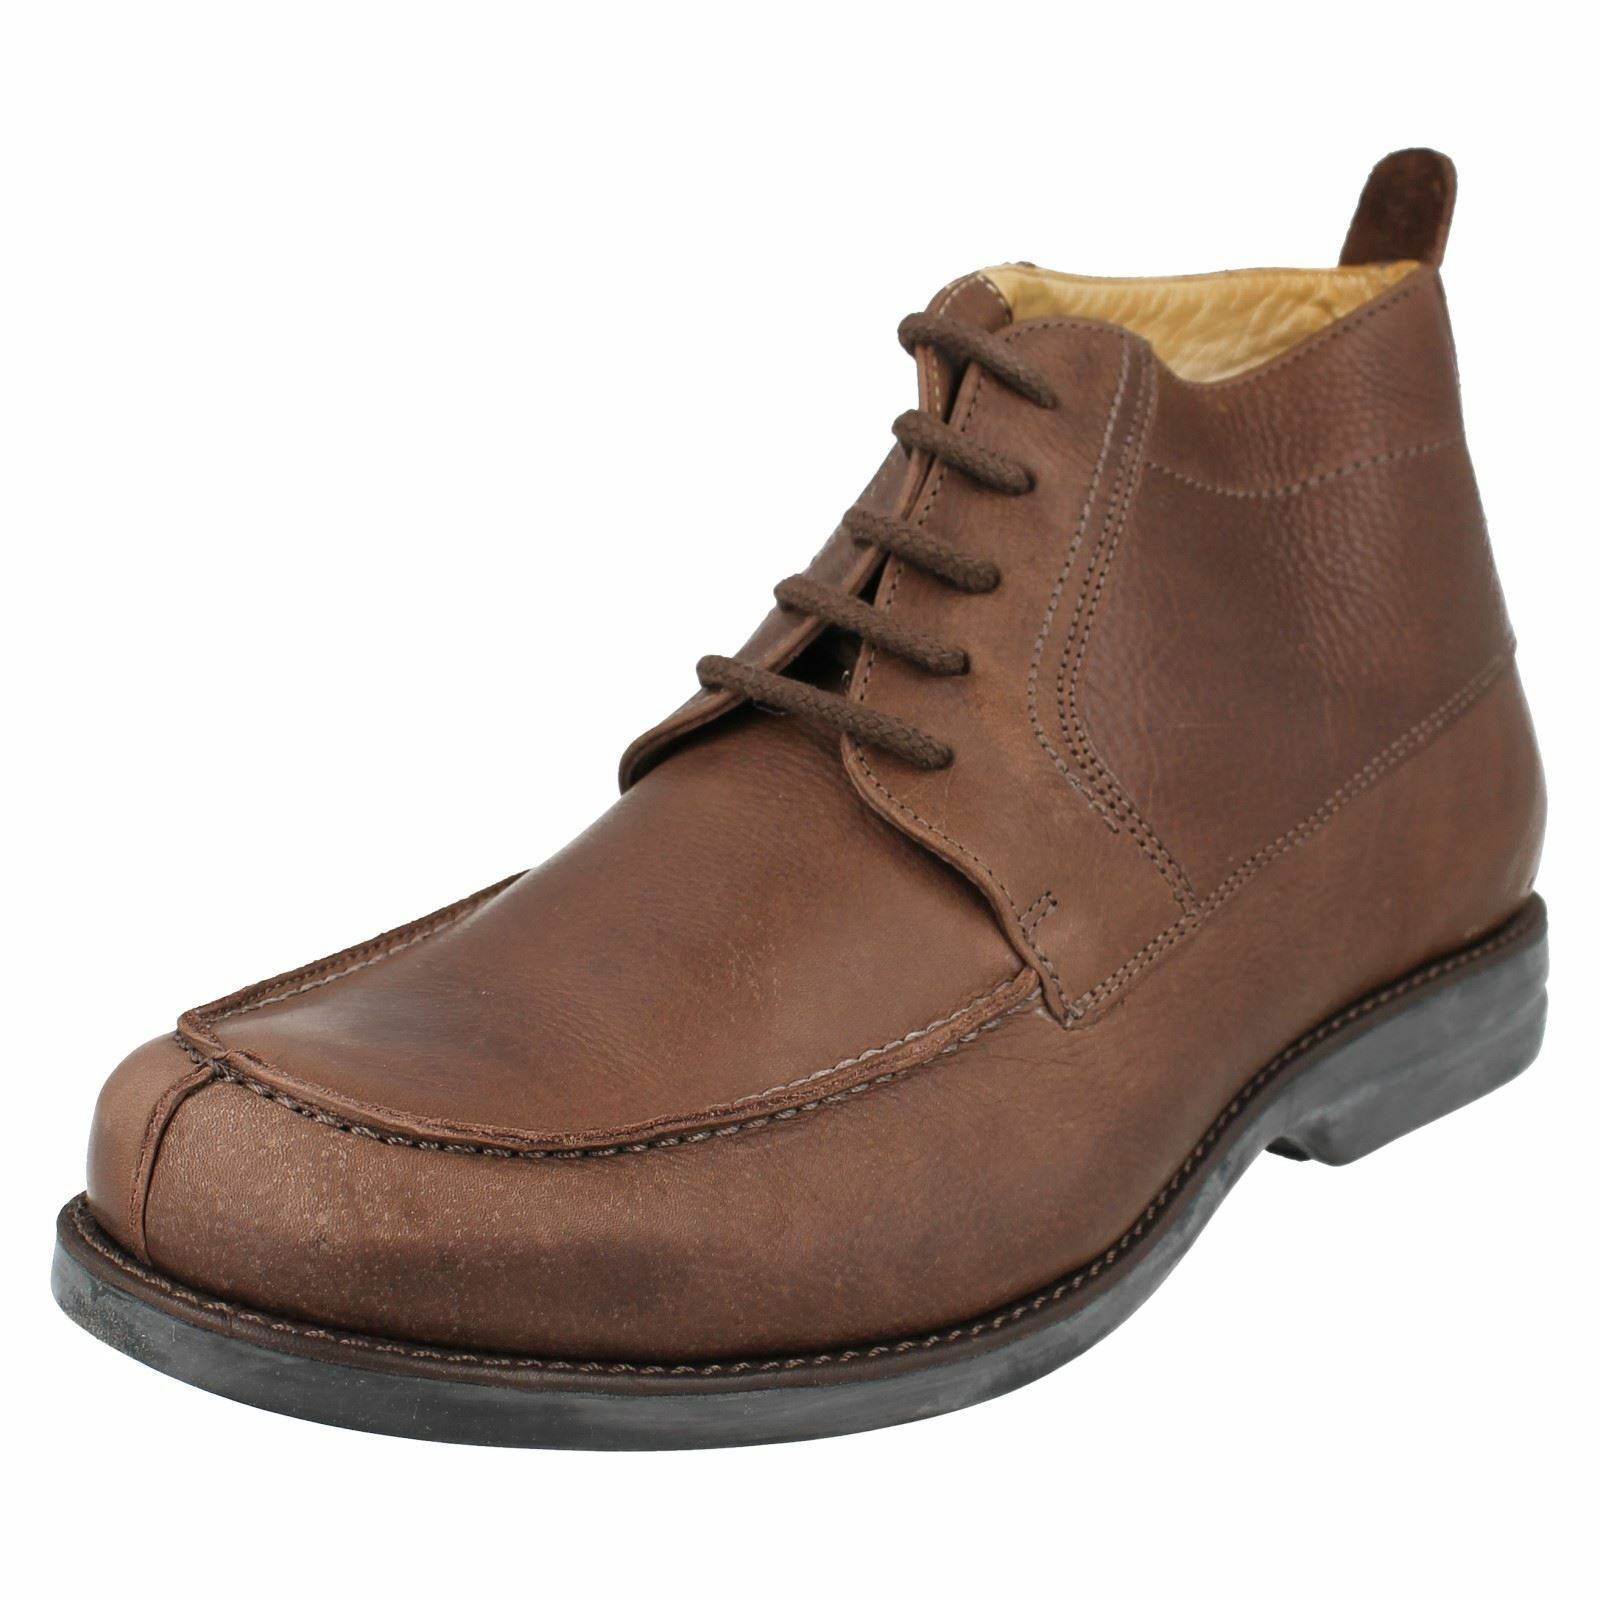 SALE Mens Anatomic & Co Lace Up Casual Boots Regalo